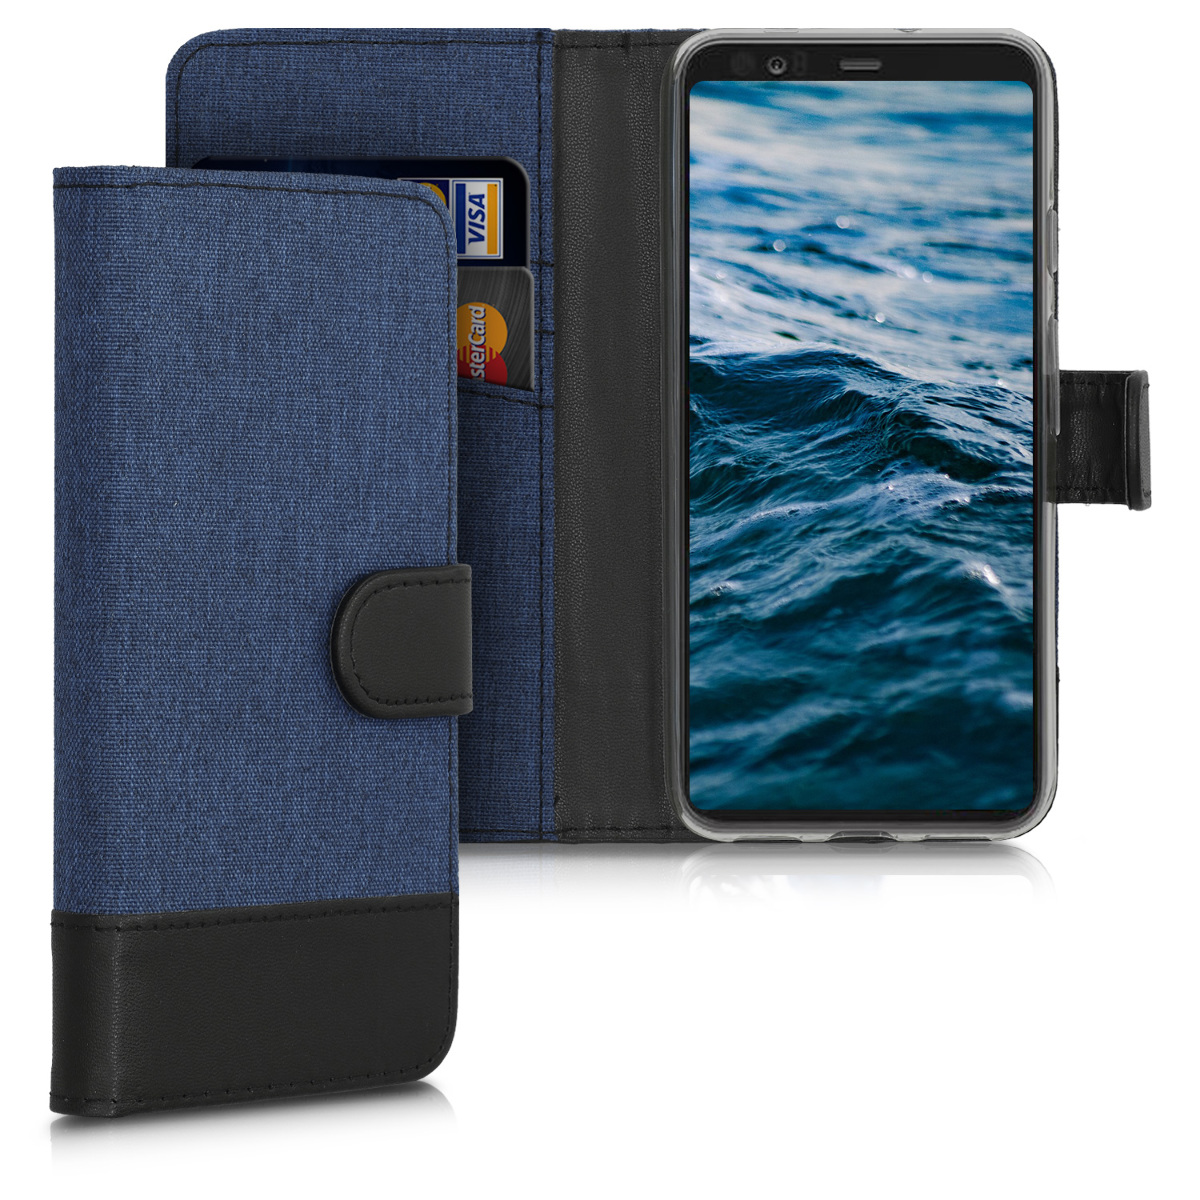 KW Θήκη - Πορτοφόλι Google Pixel 4 - Fabric and PU Leather Flip Cover - Dark Blue / Black (50375.17)